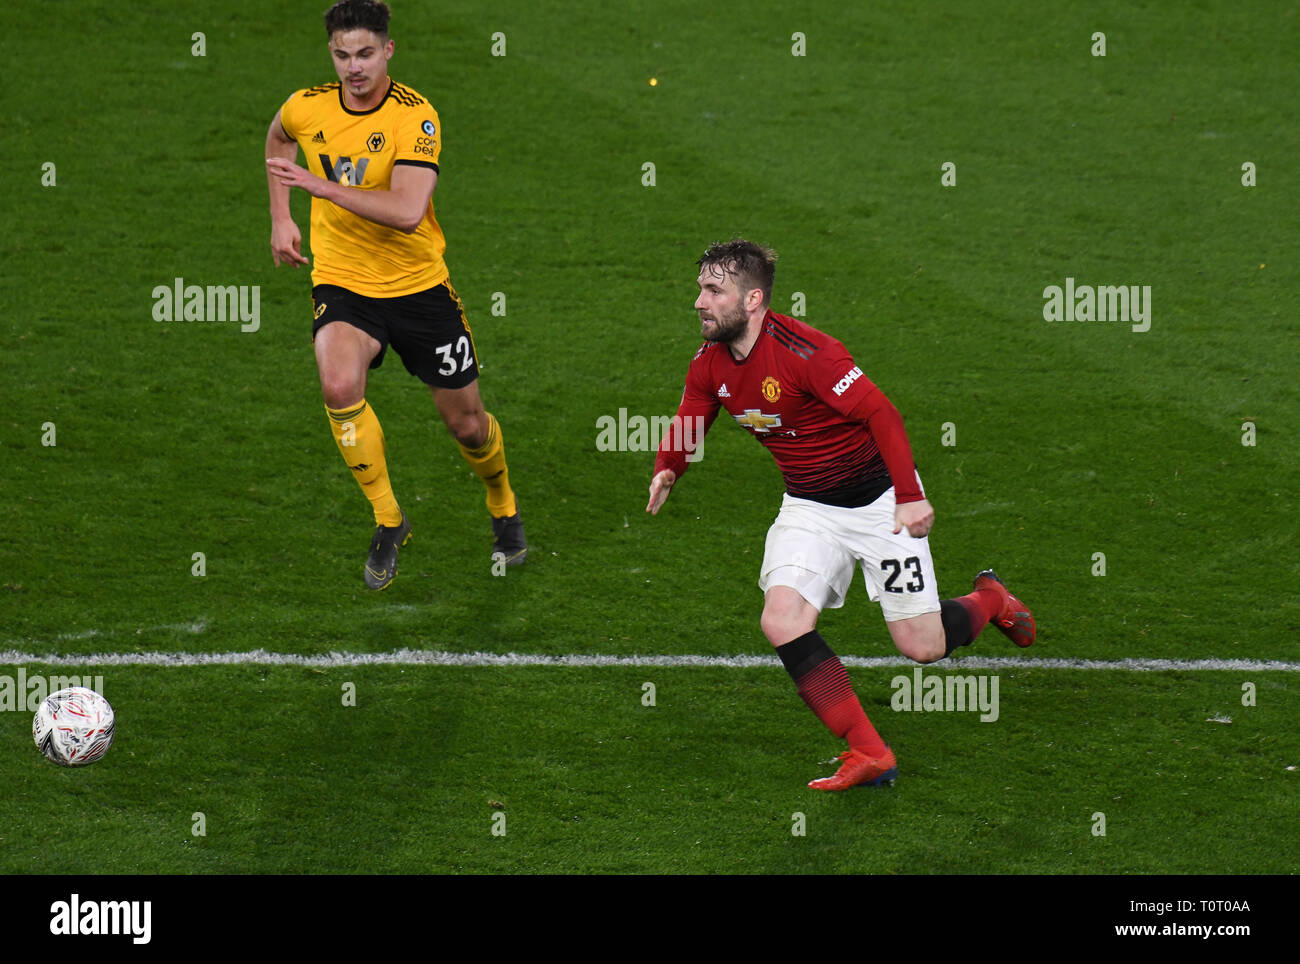 bf1ba341624 Football action footballer Luke Shaw Wolverhampton Wanderers v Manchester  United 2019 - Stock Image